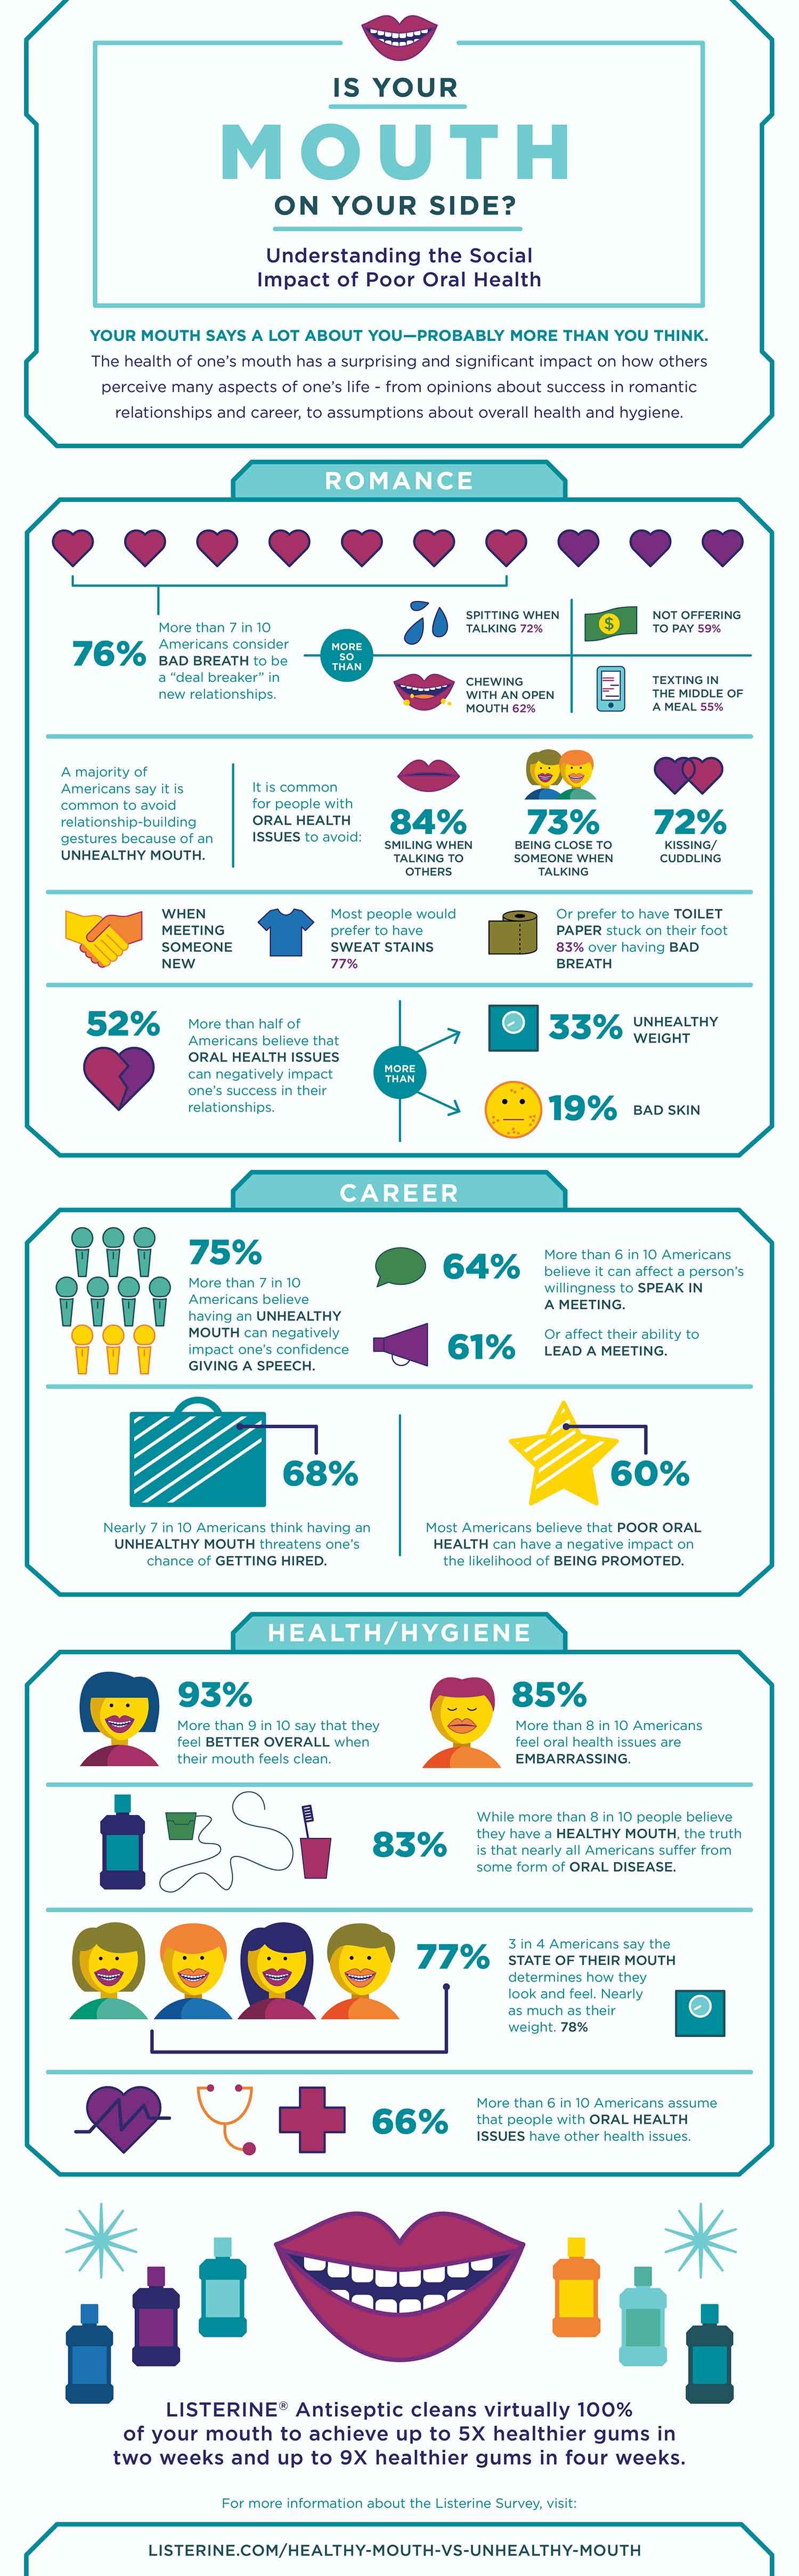 infographic3_anneulku.jpg